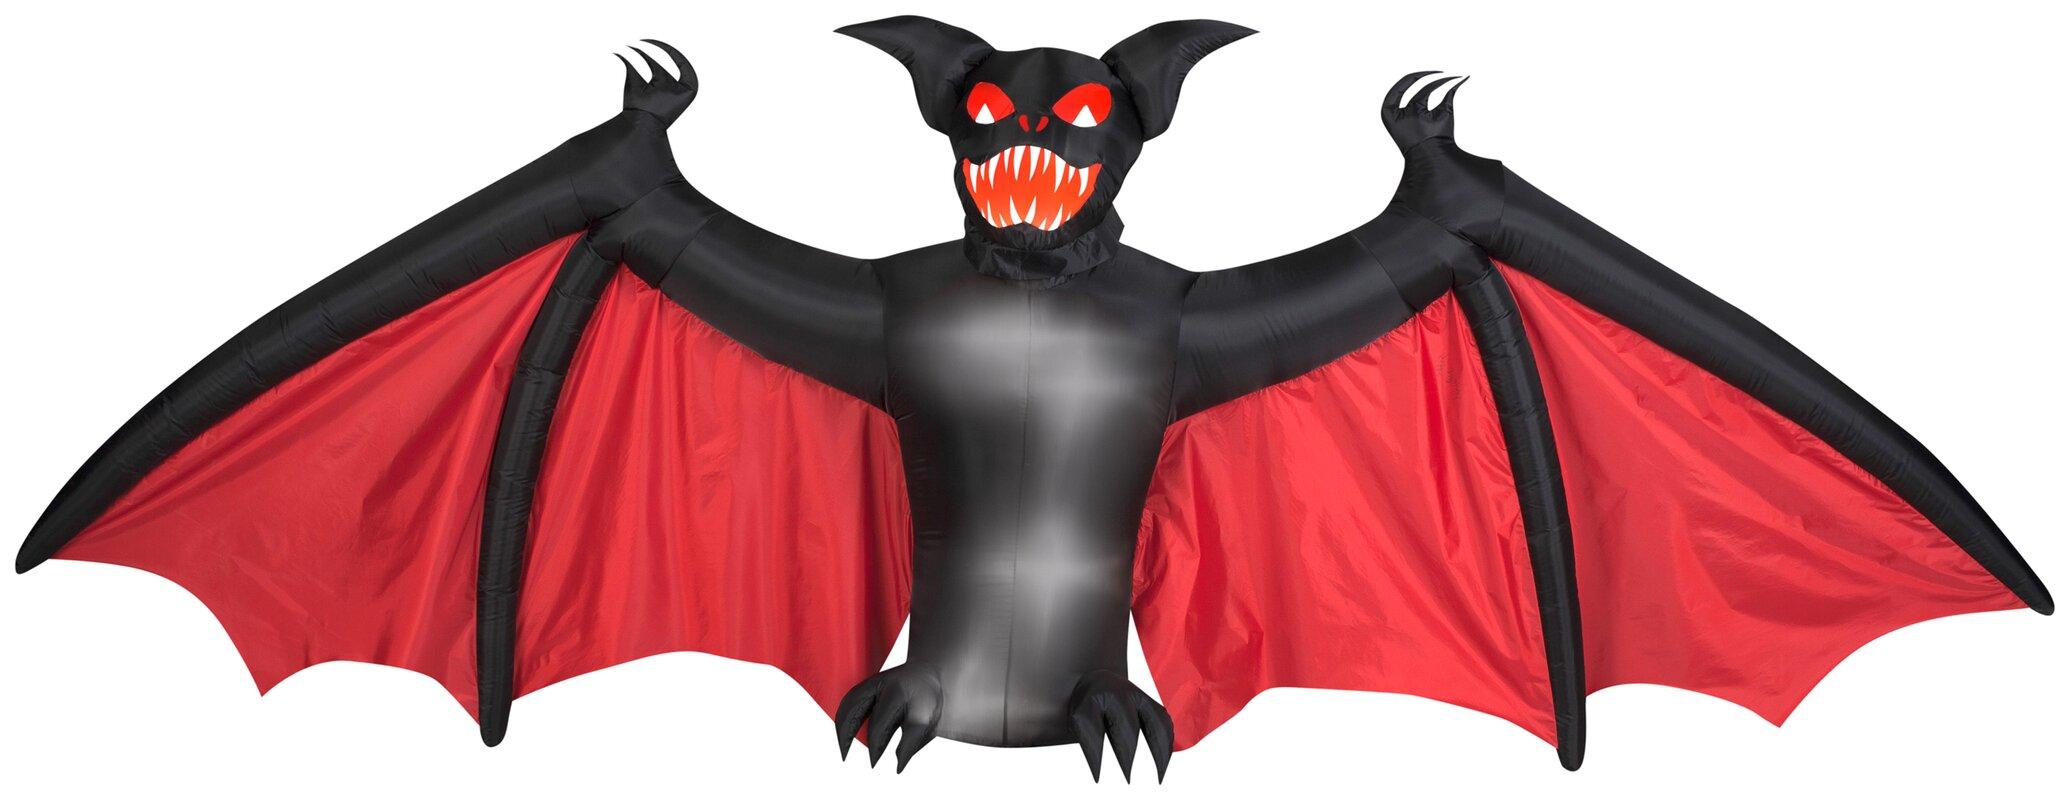 default_name - Halloween Bats Decorations